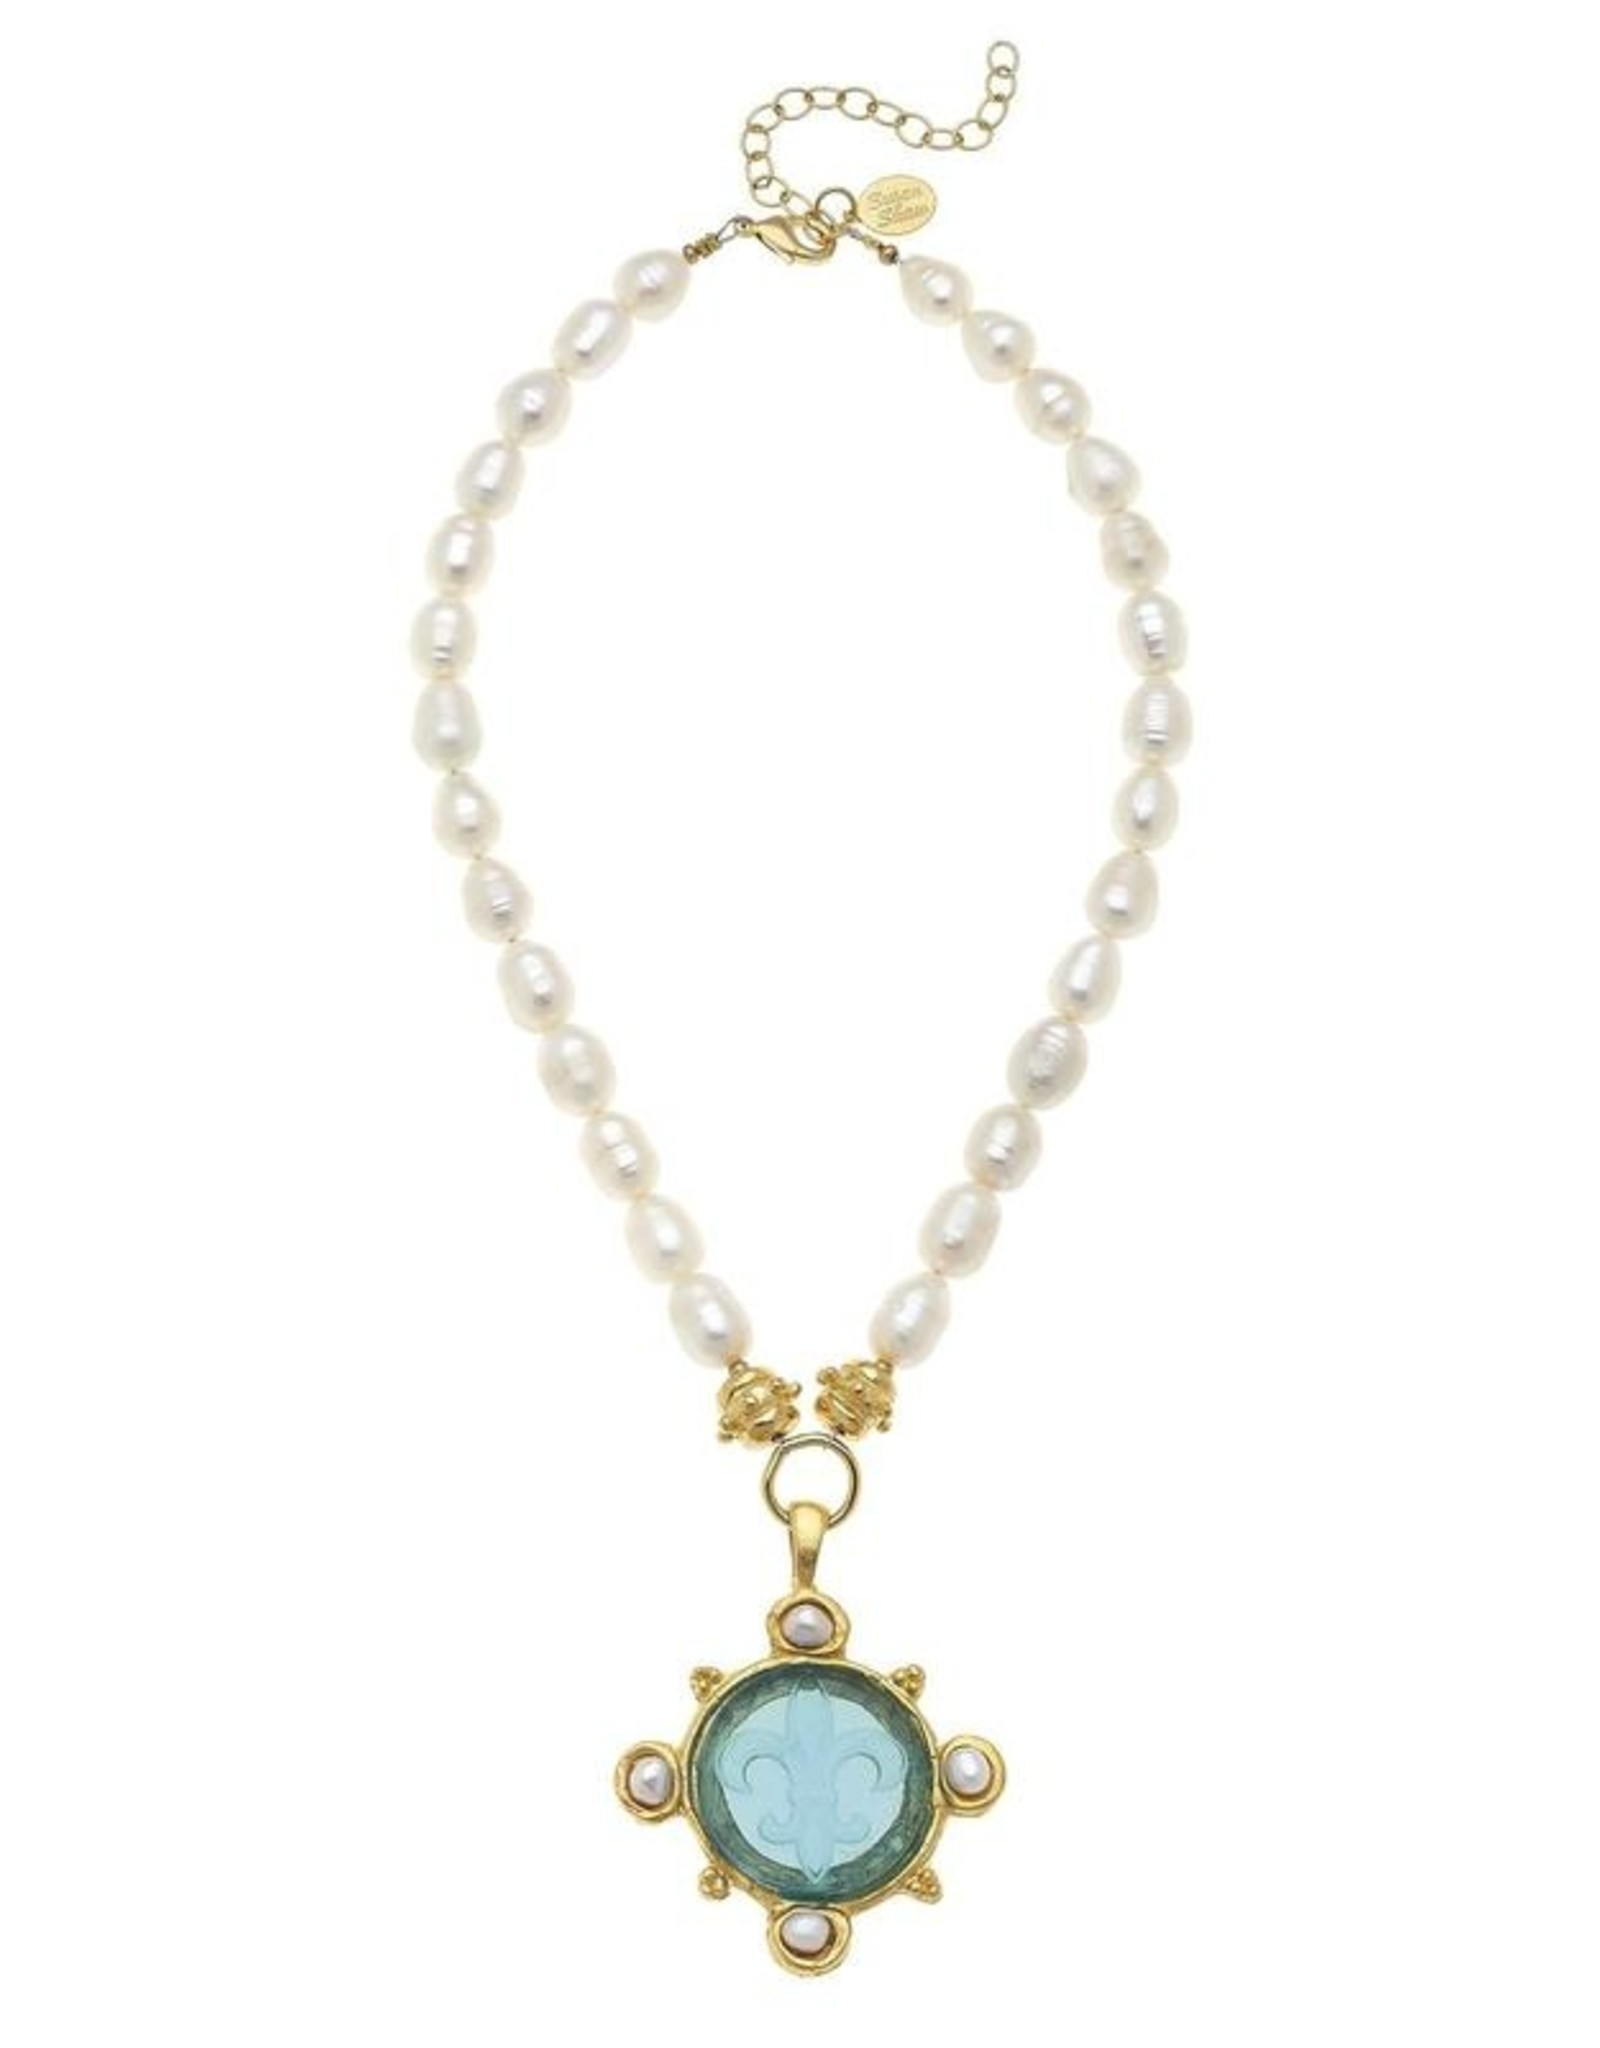 Susan Shaw Shaw Necklace Pearls/Blue Fleur de Lis Intaglio 4 Pearl Accent